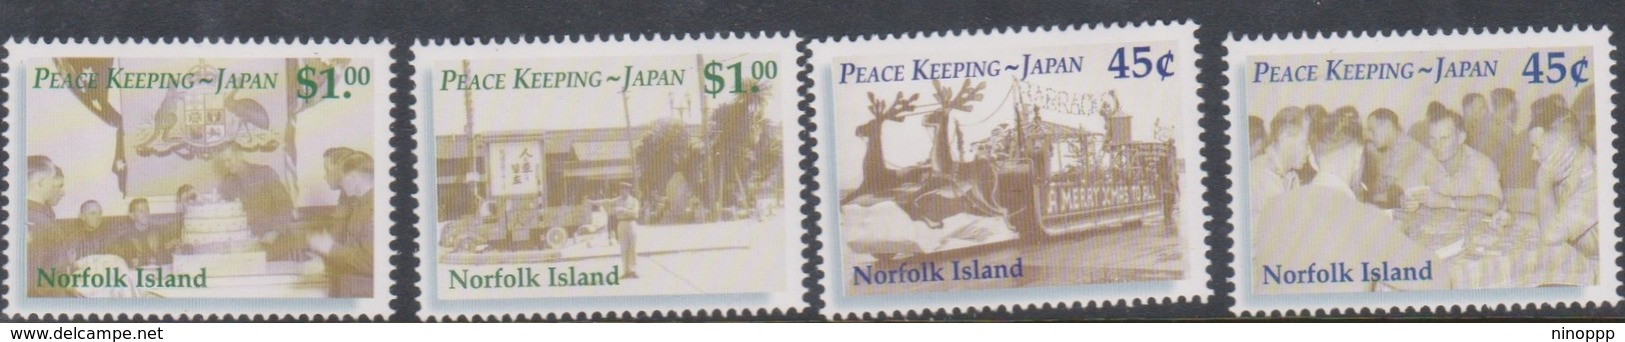 Norfolk Island ASC 760-763 2001 Peacekeeping Forces, Mint Never Hinged - Norfolk Island